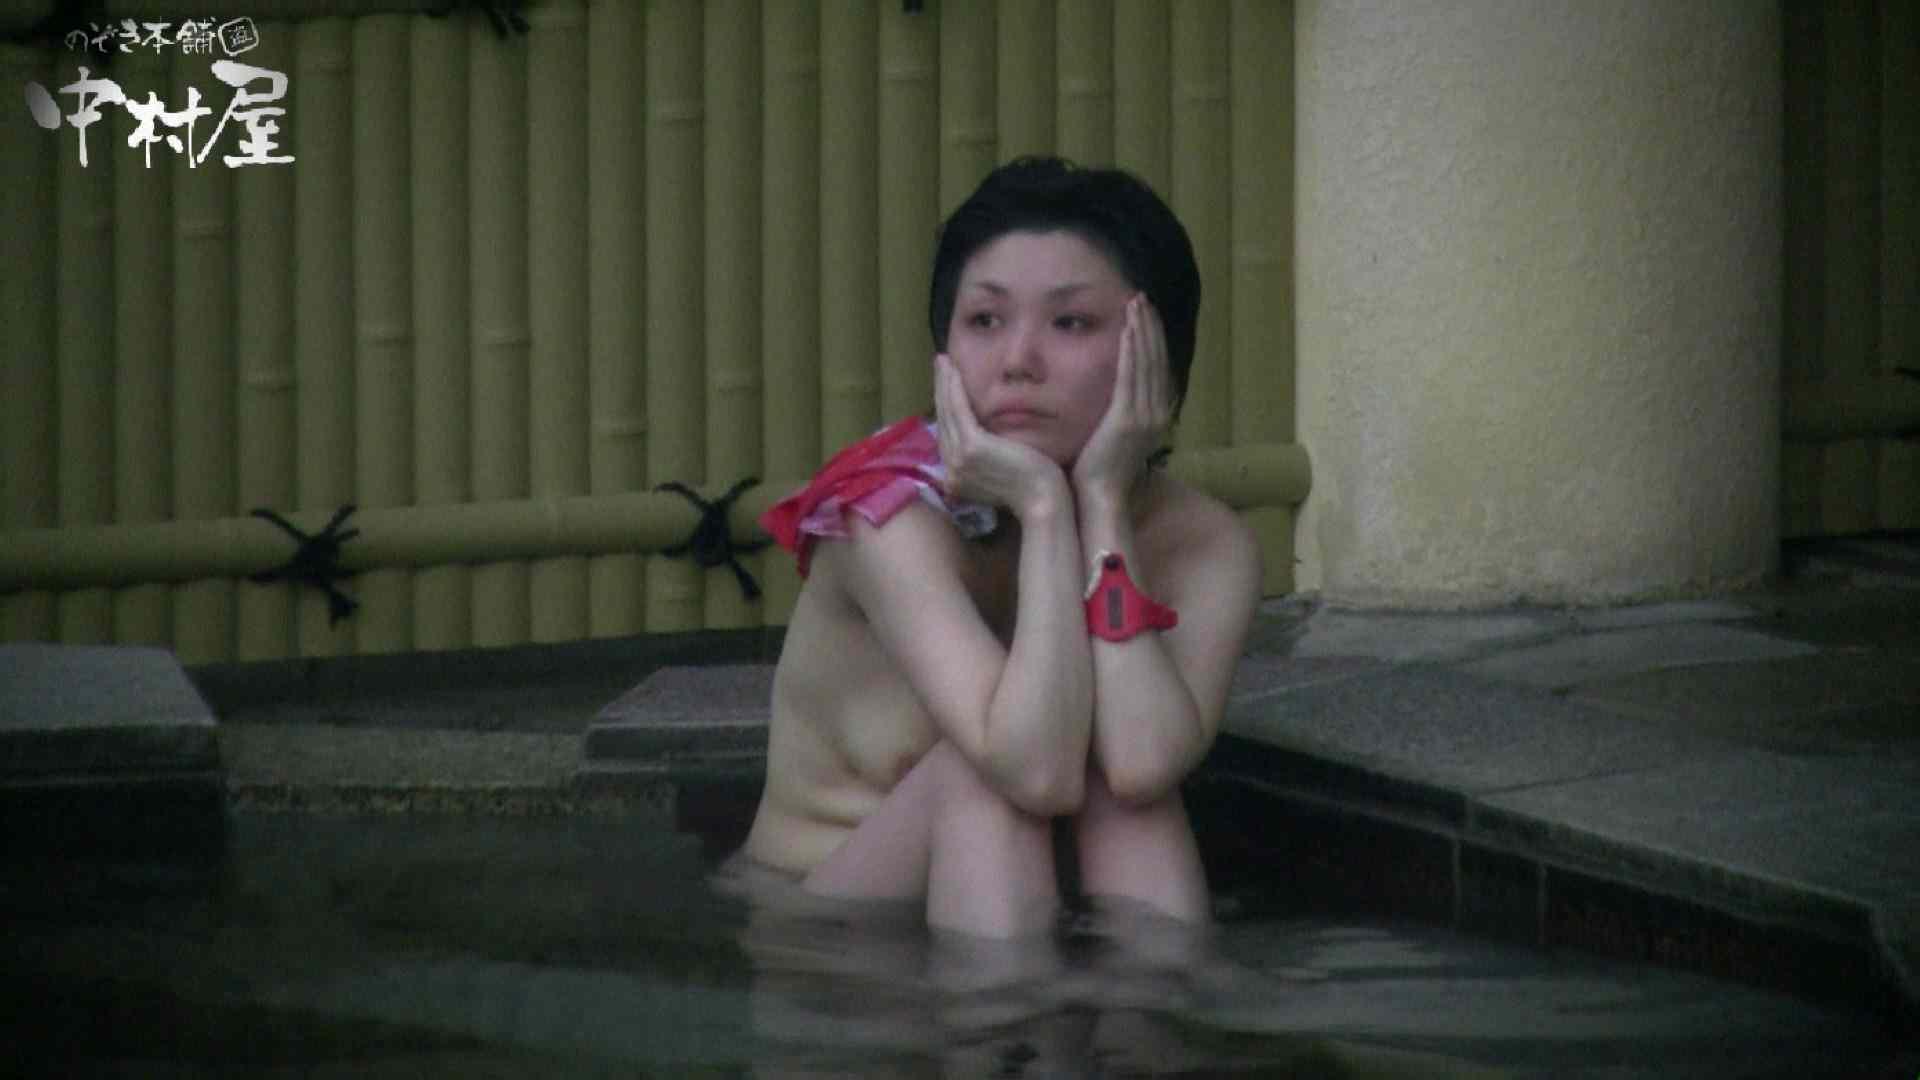 Aquaな露天風呂Vol.884 露天風呂突入 ワレメ動画紹介 92pic 8